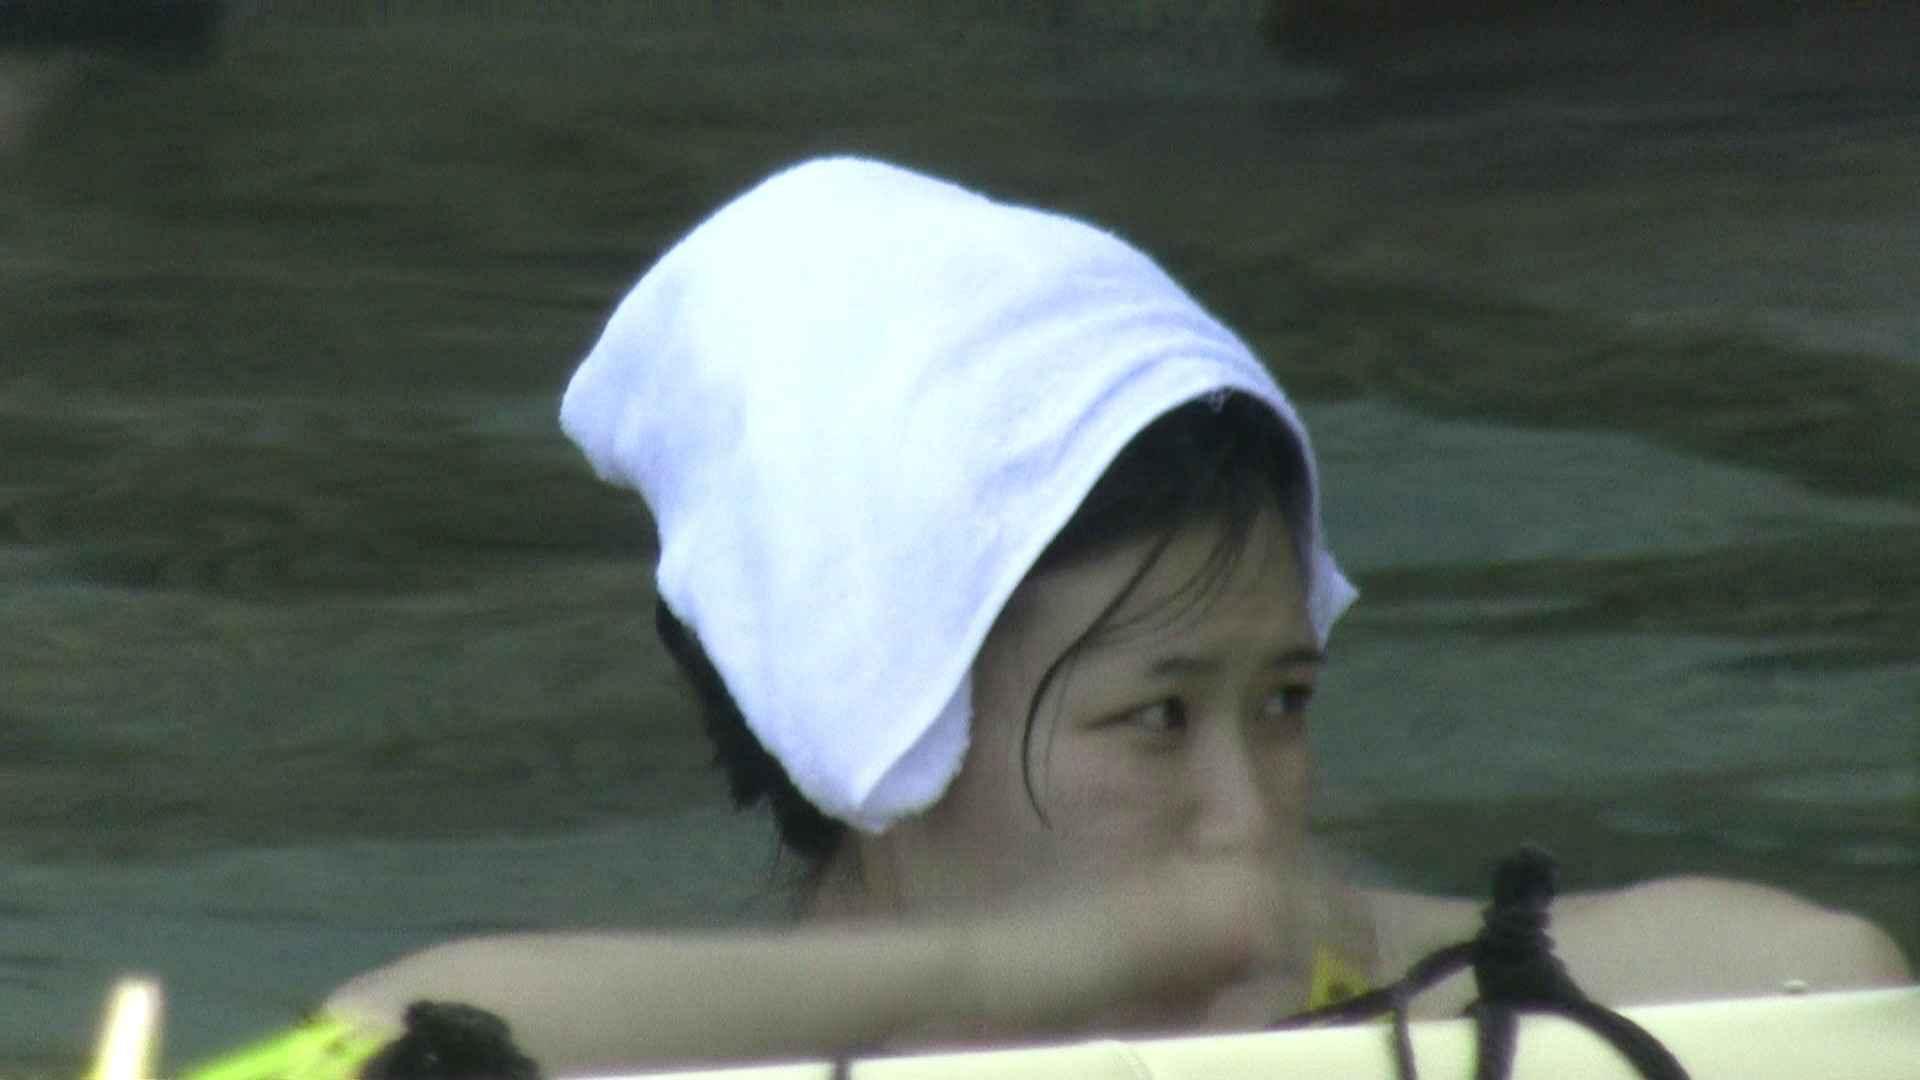 Aquaな露天風呂Vol.183 露天 濡れ場動画紹介 106pic 49